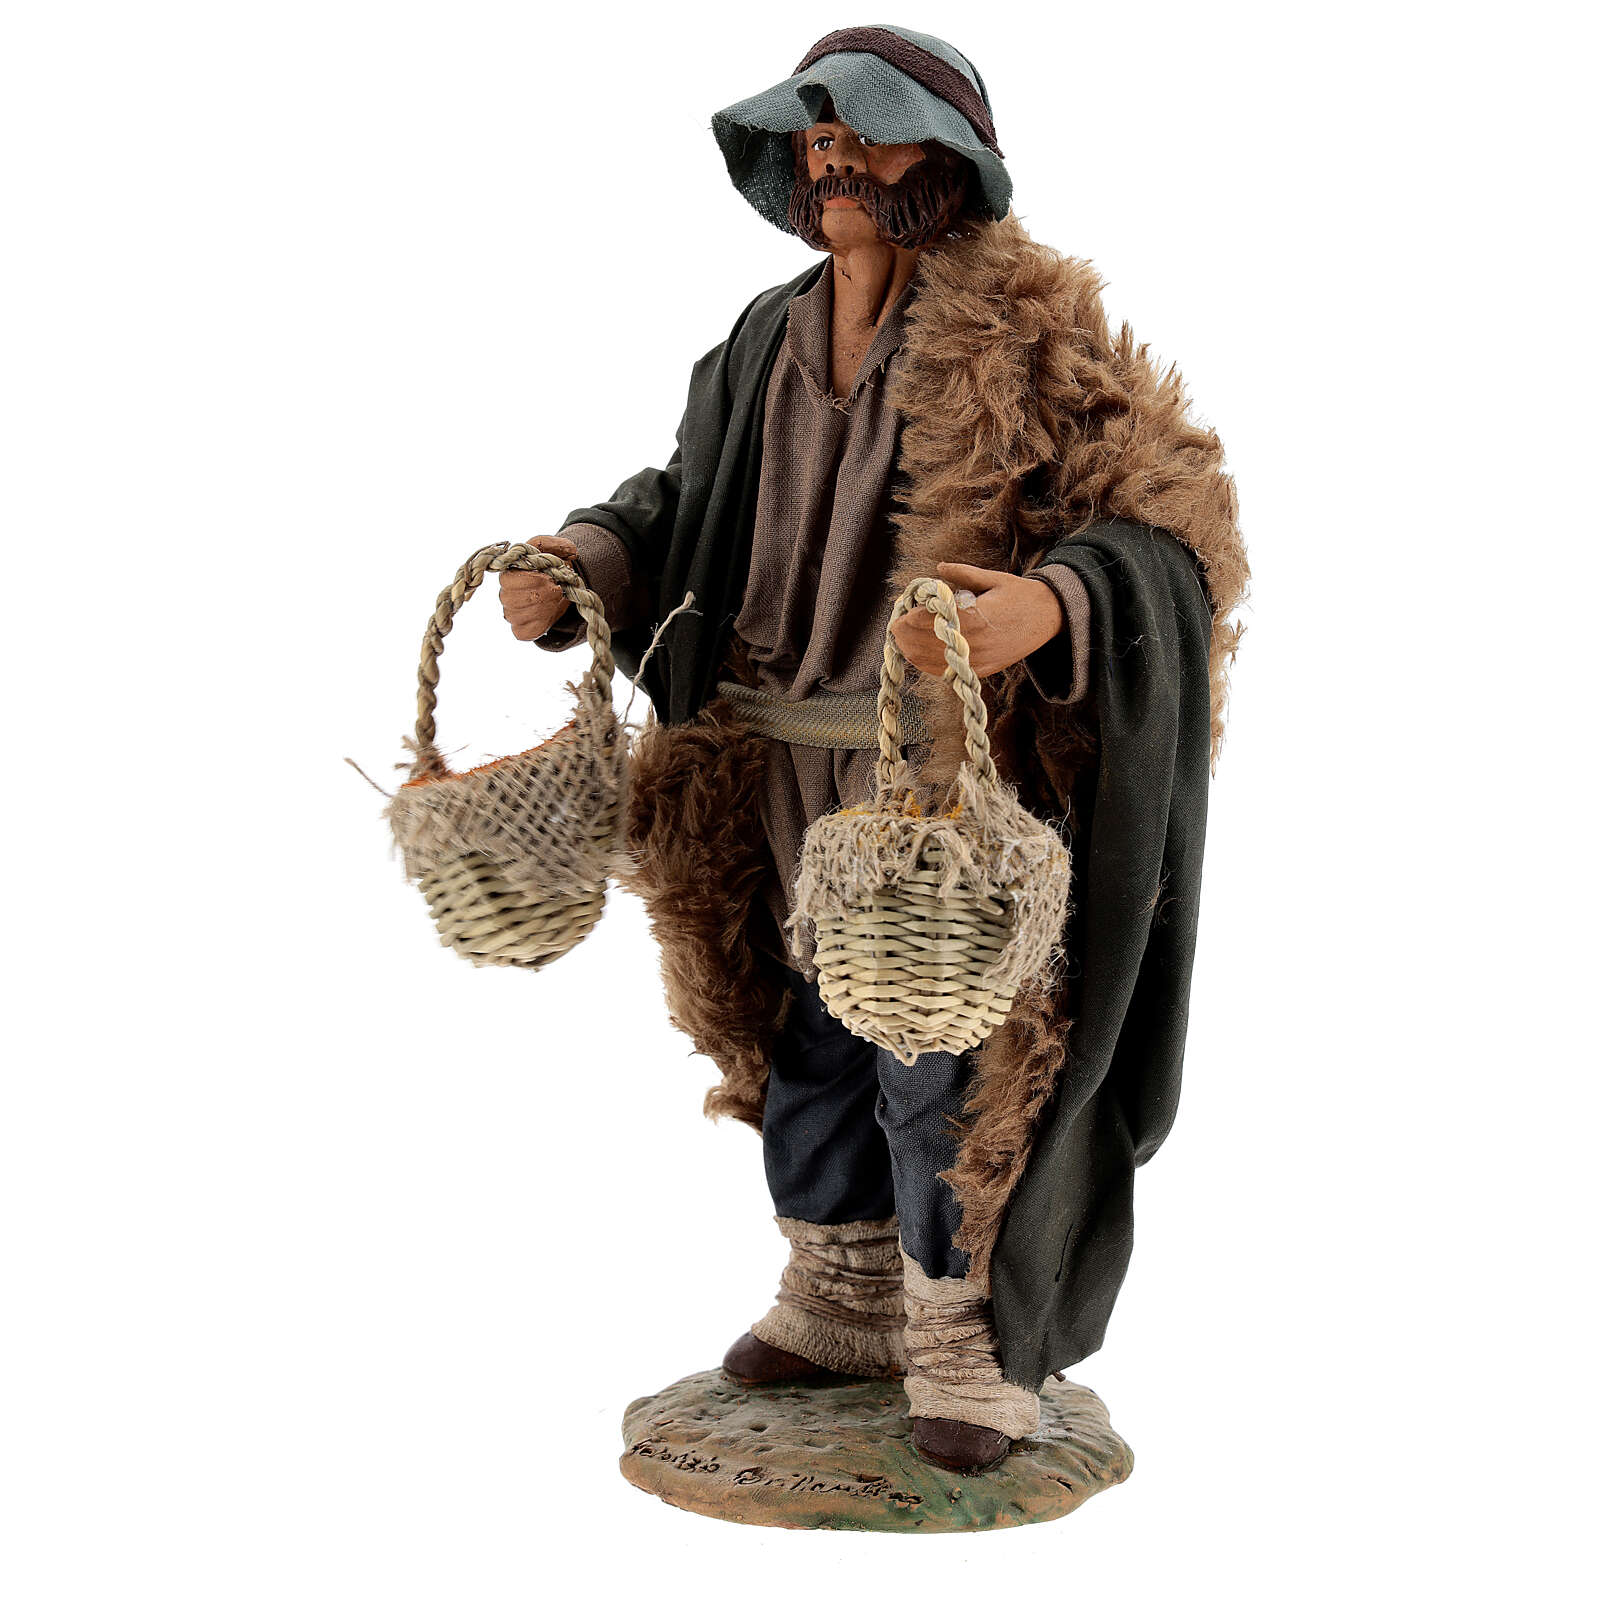 Spice seller figure, 24 cm Neapolitan nativity 4